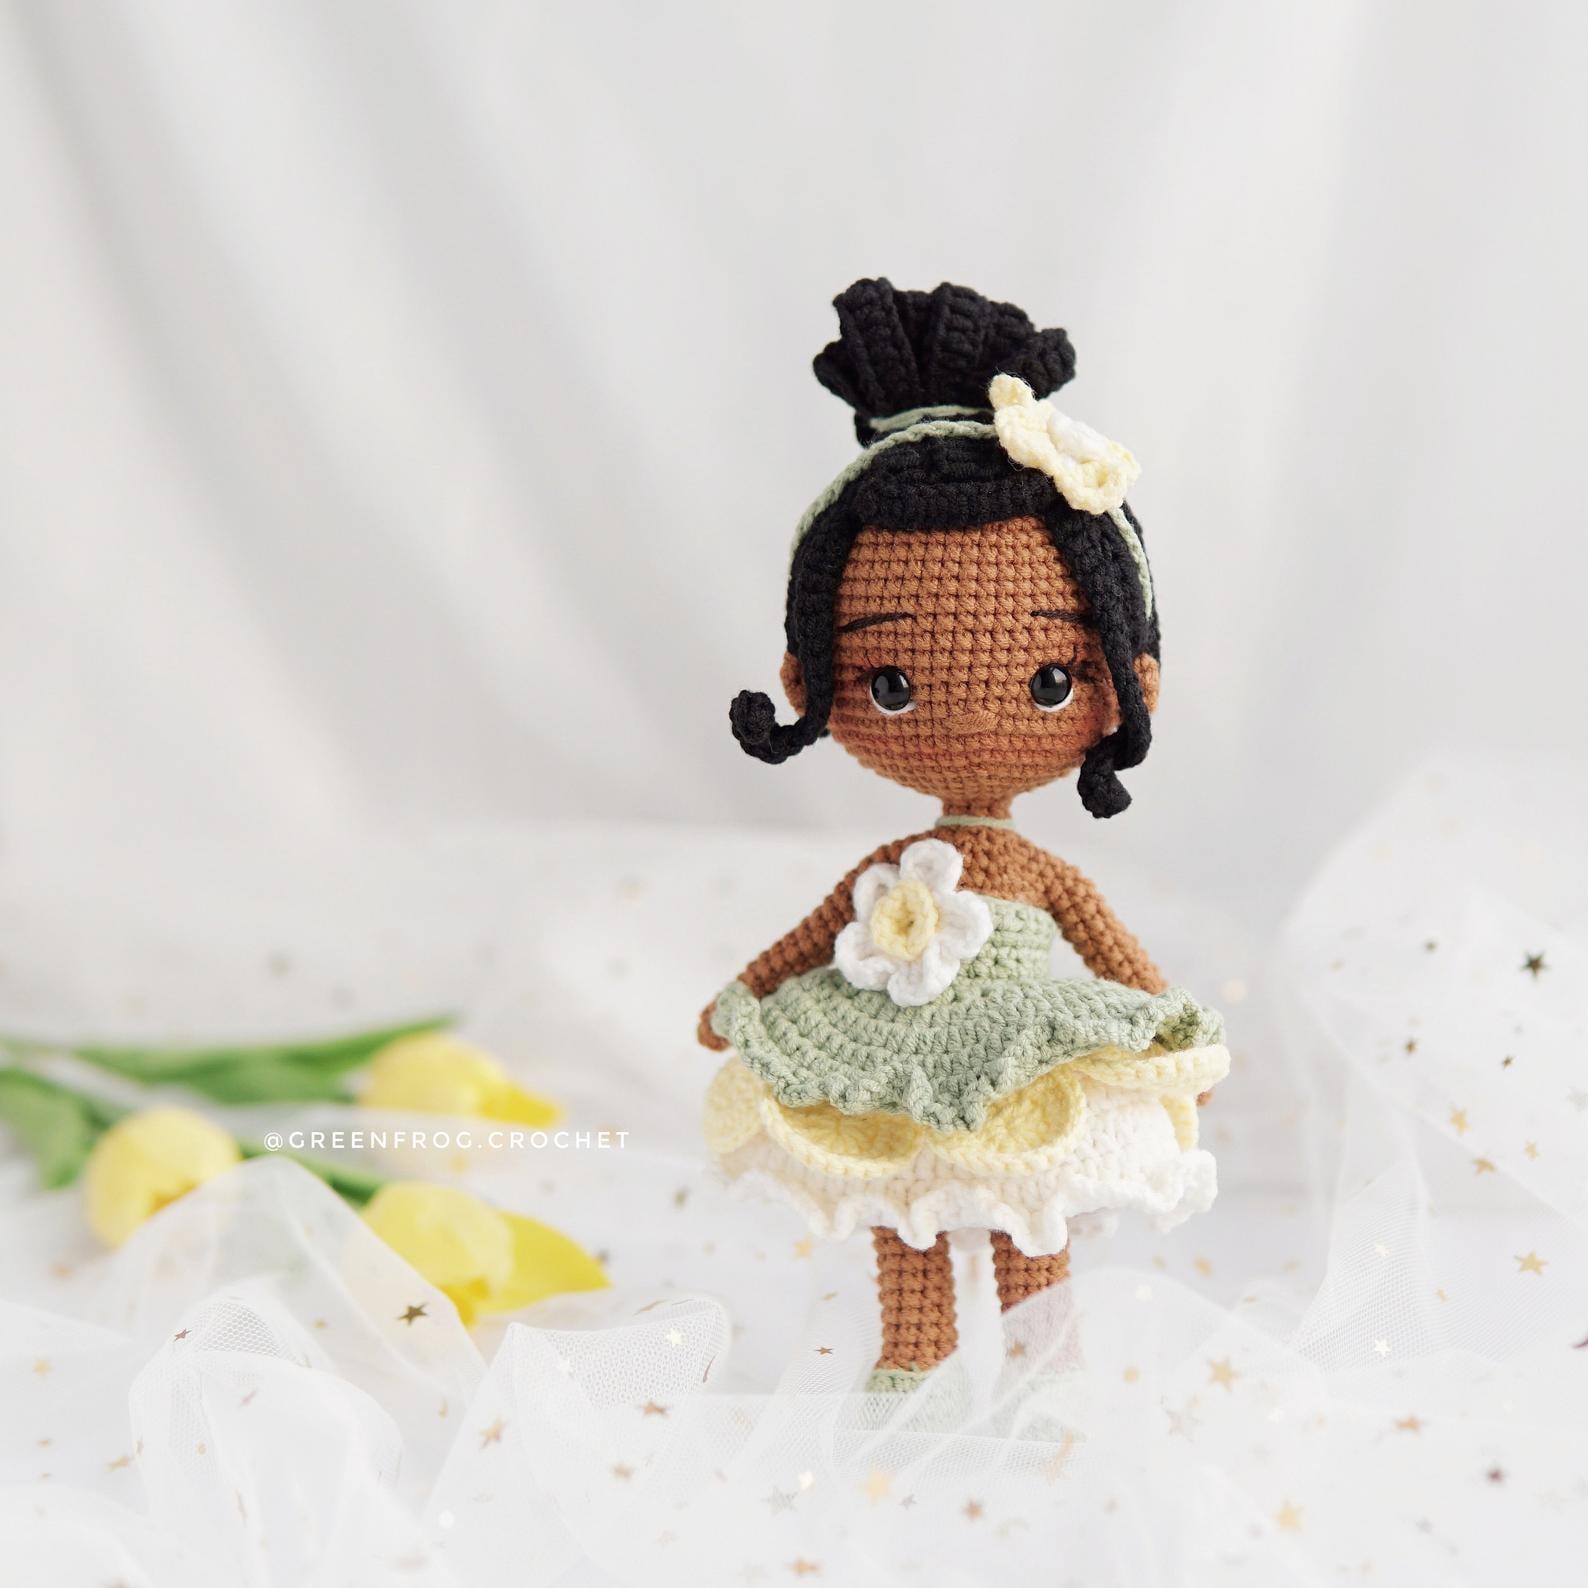 Amigurumi Cinderella doll (Disney princess) - free crochet pattern ... | 1588x1588